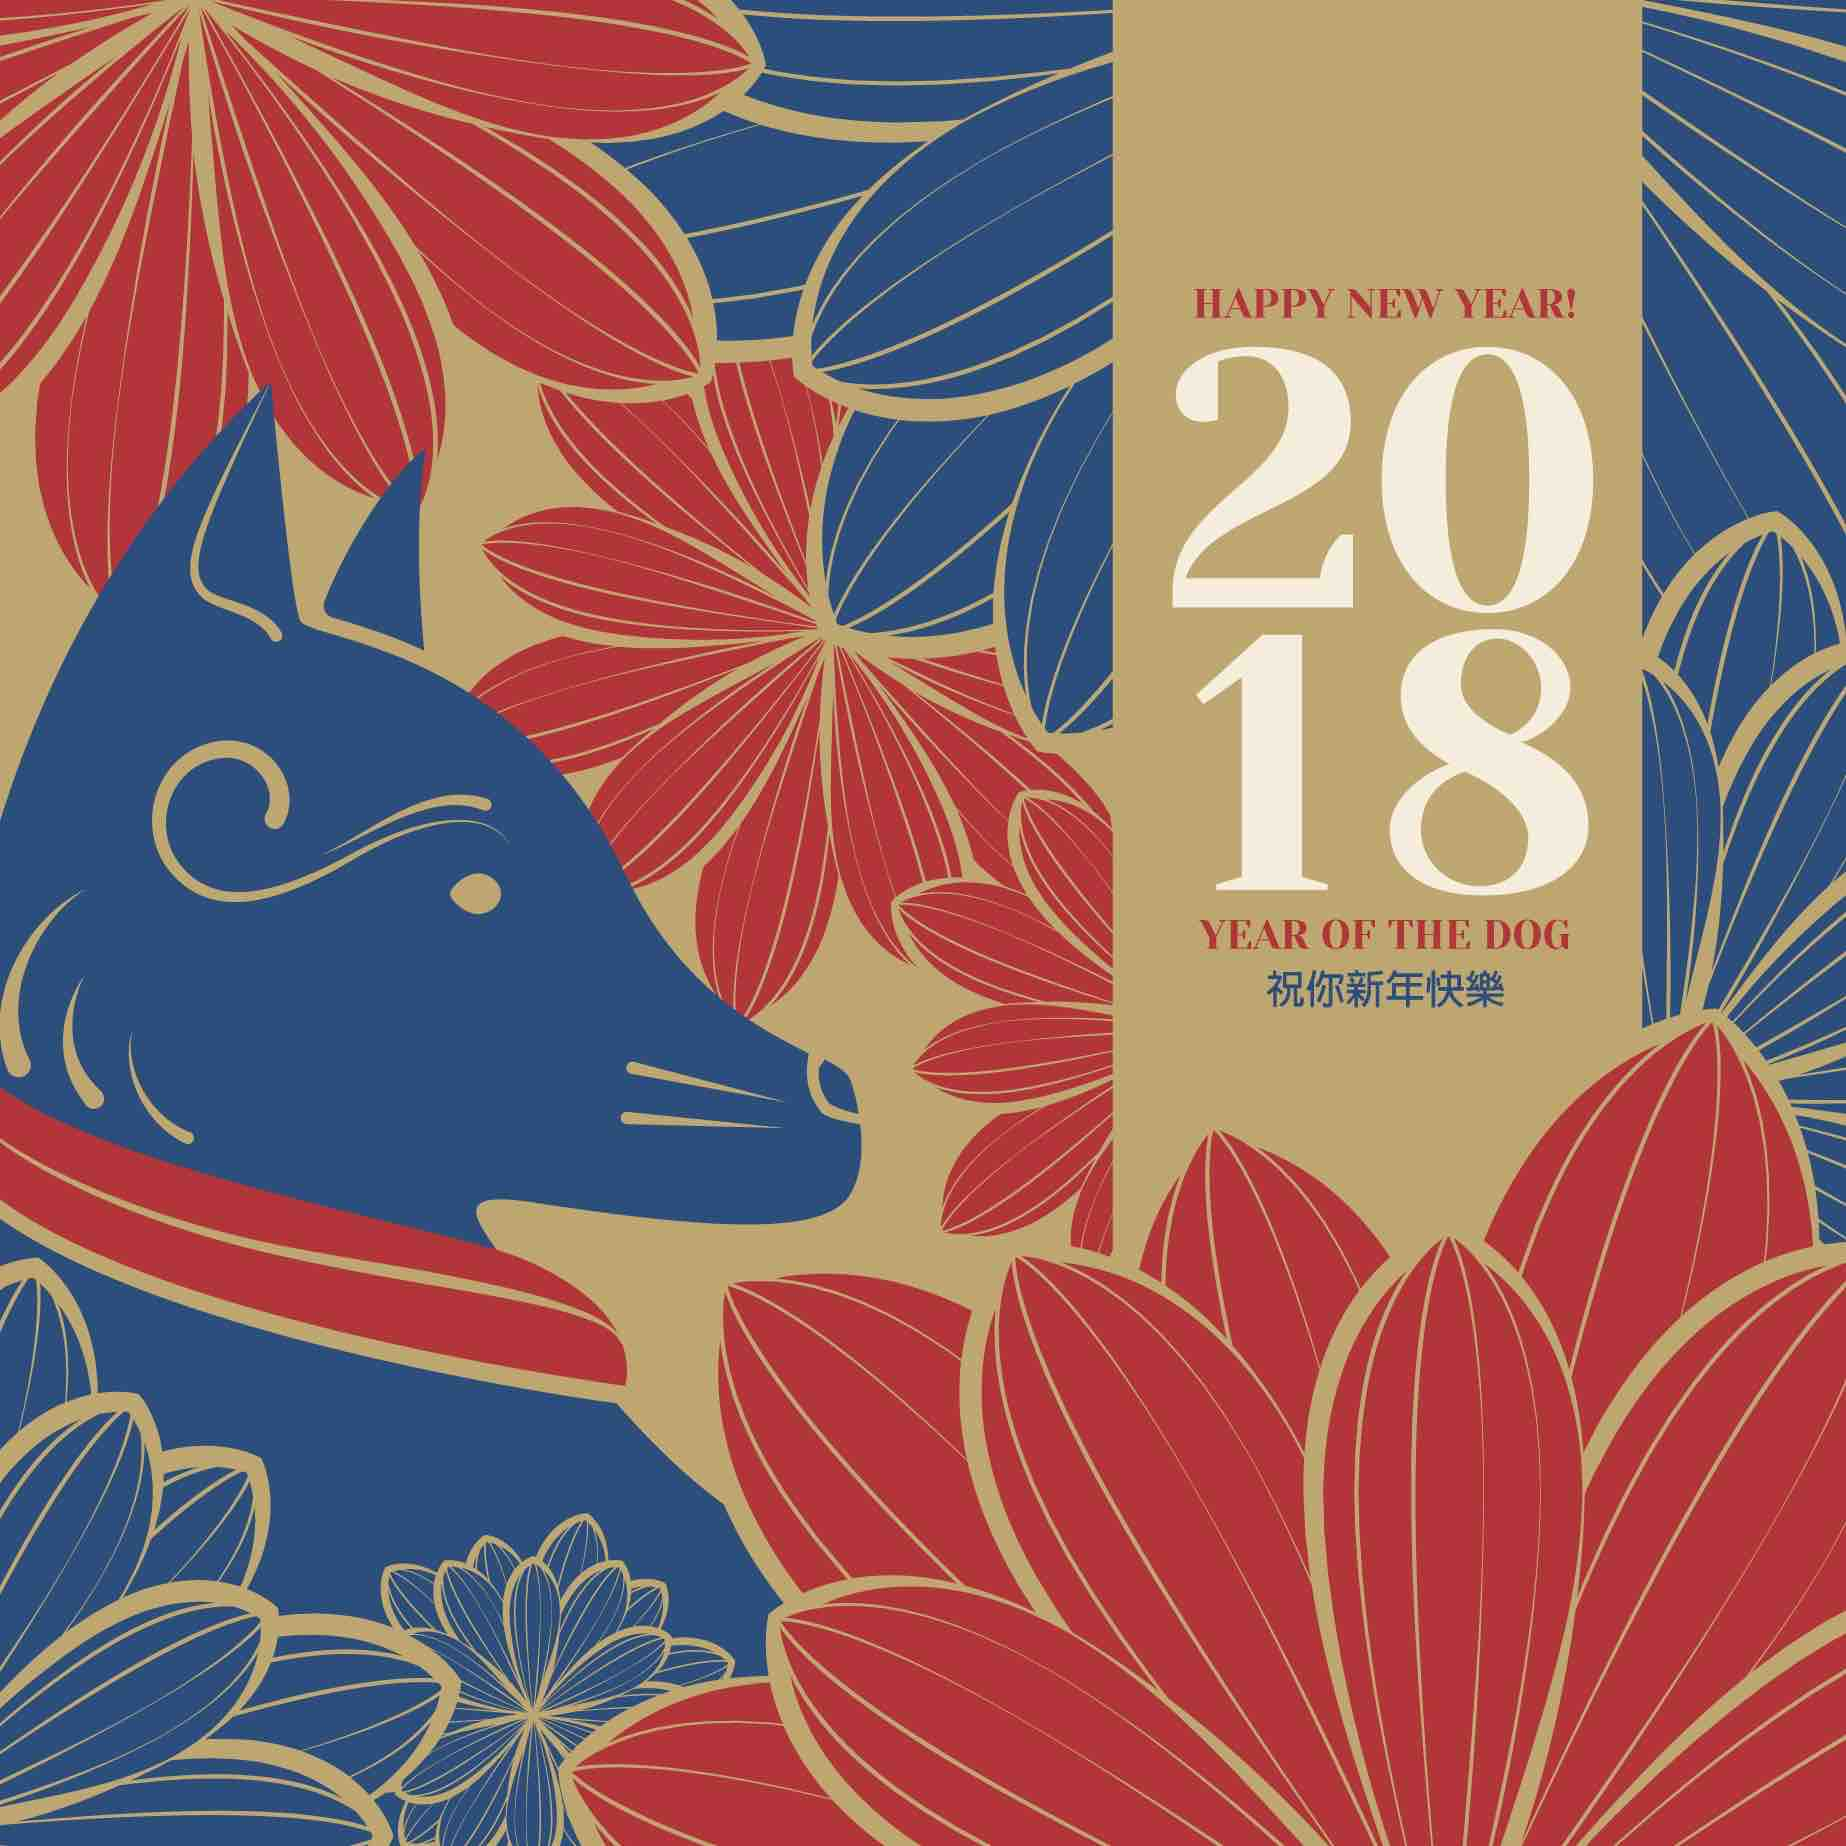 nouvel an chinois 2018 l 39 ann e du chien de terre moving tahiti. Black Bedroom Furniture Sets. Home Design Ideas